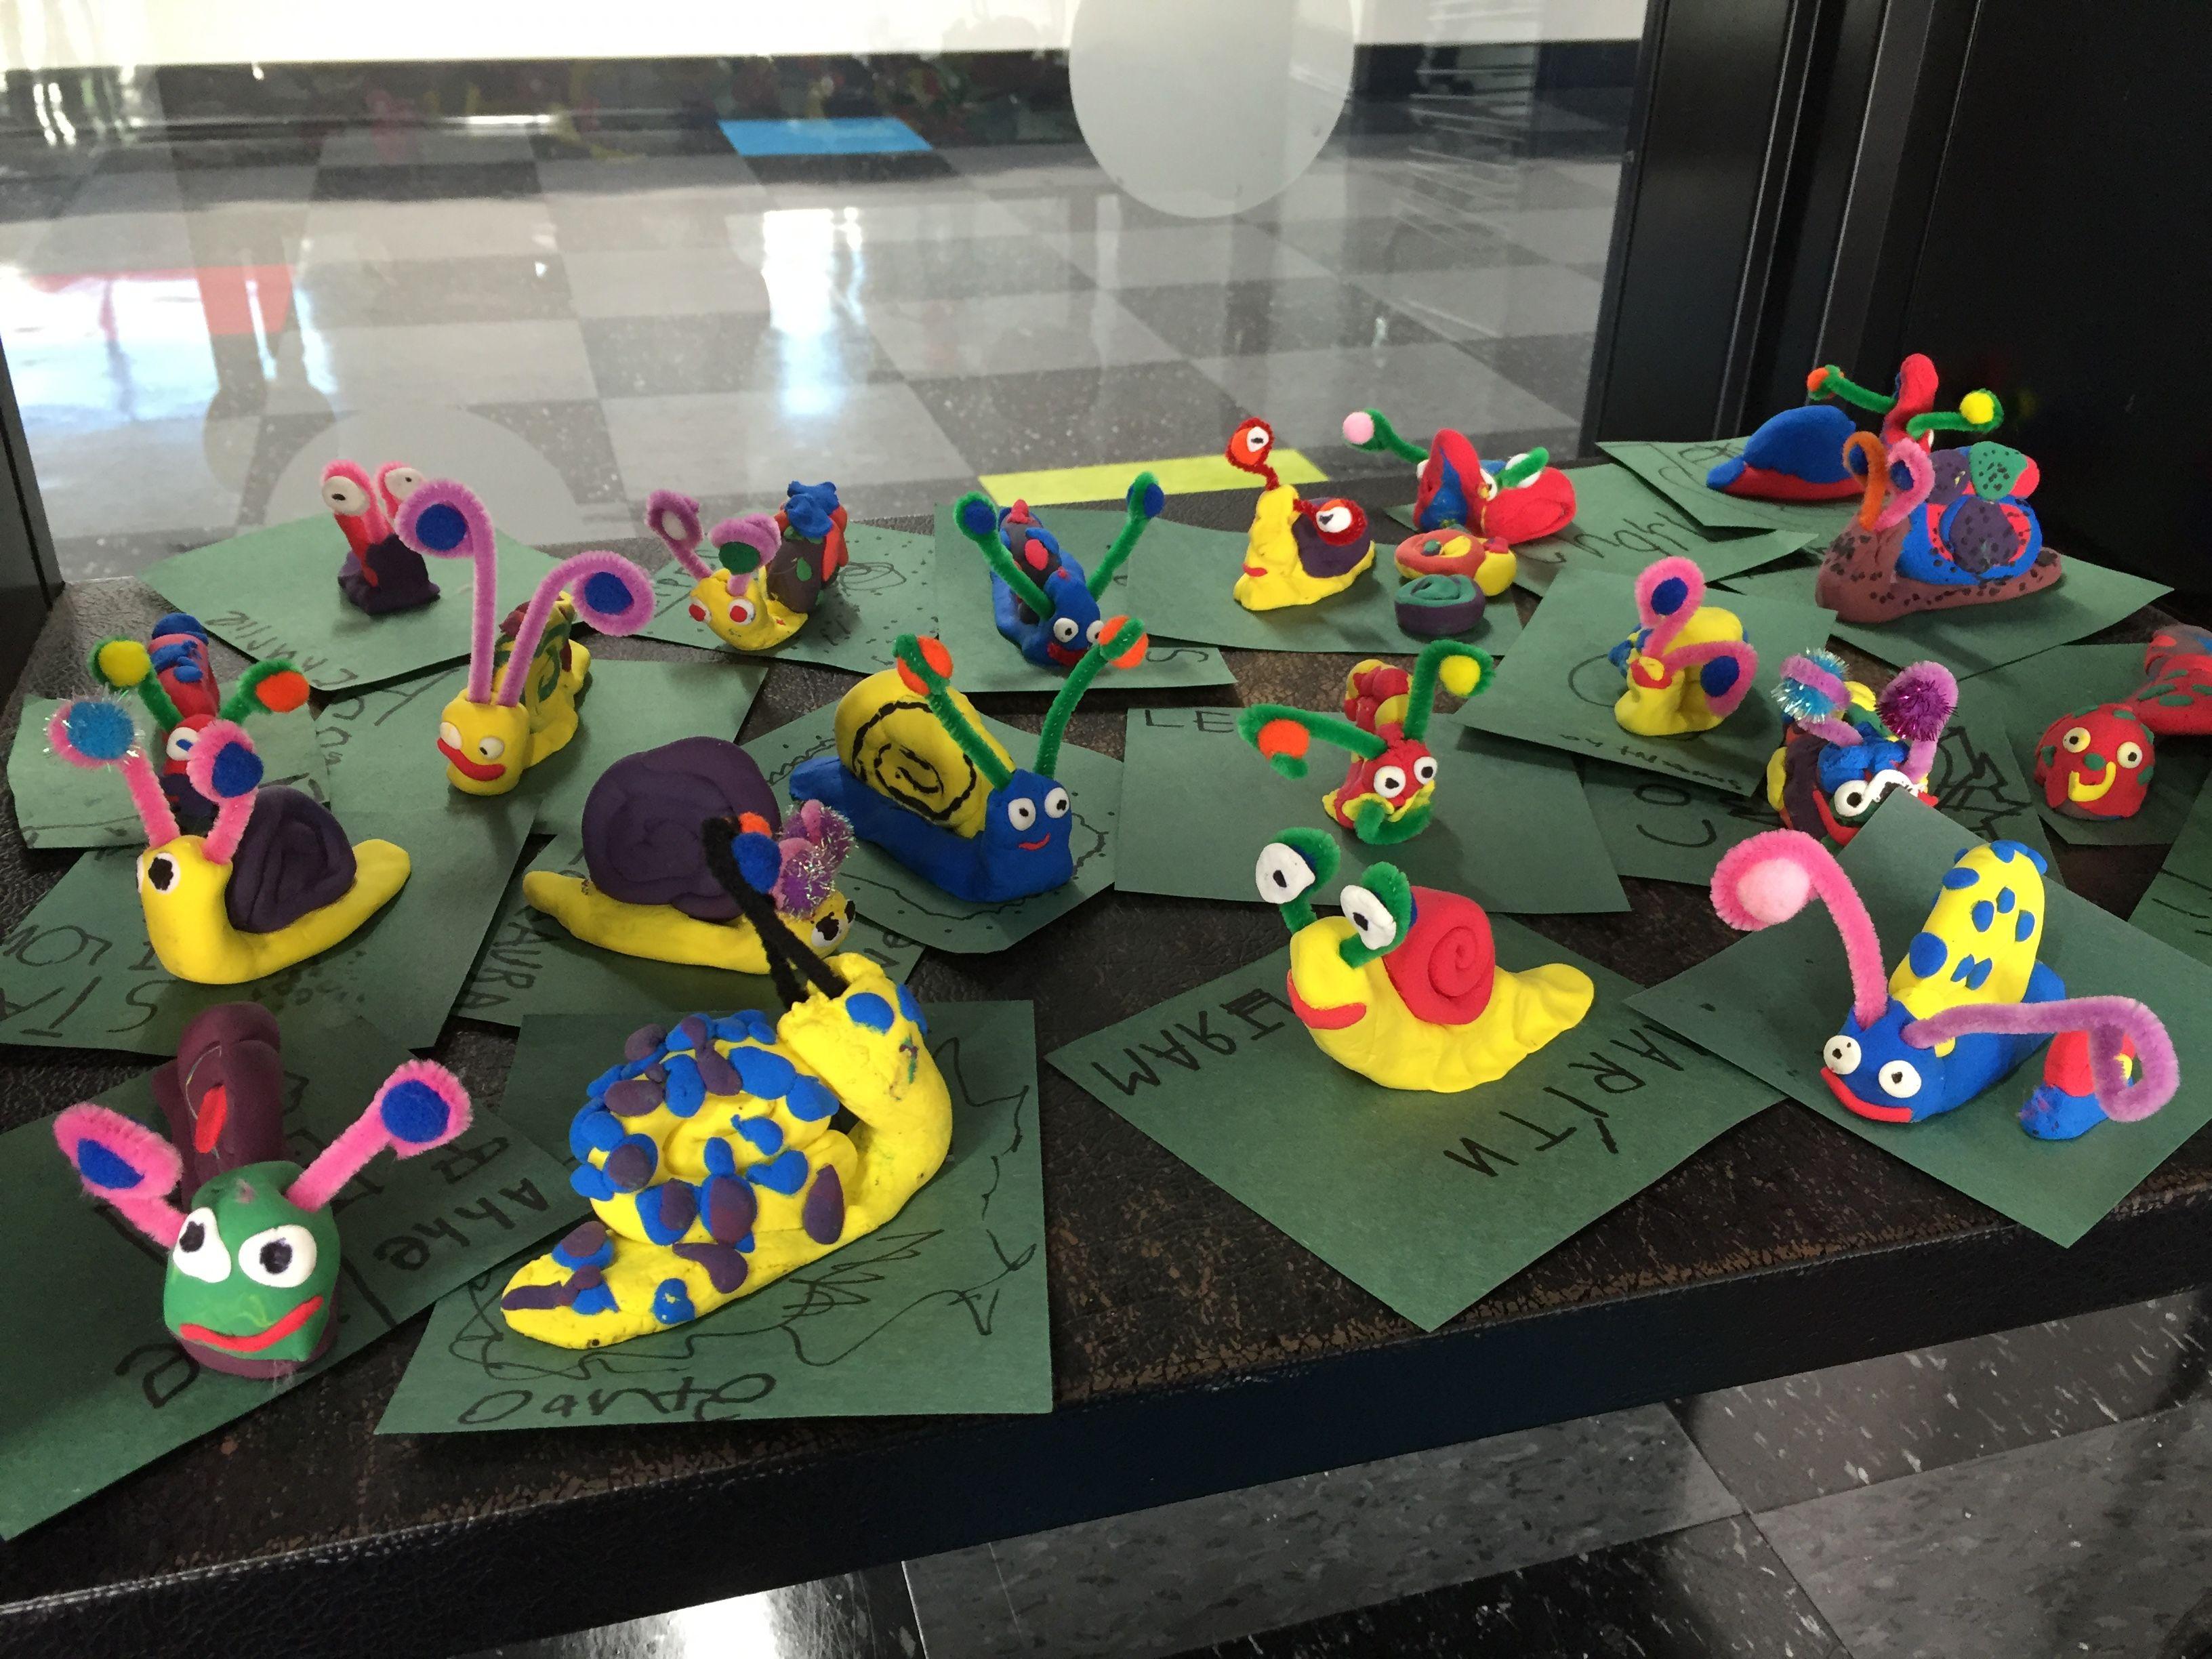 Kindergarten snail sculptures by my students